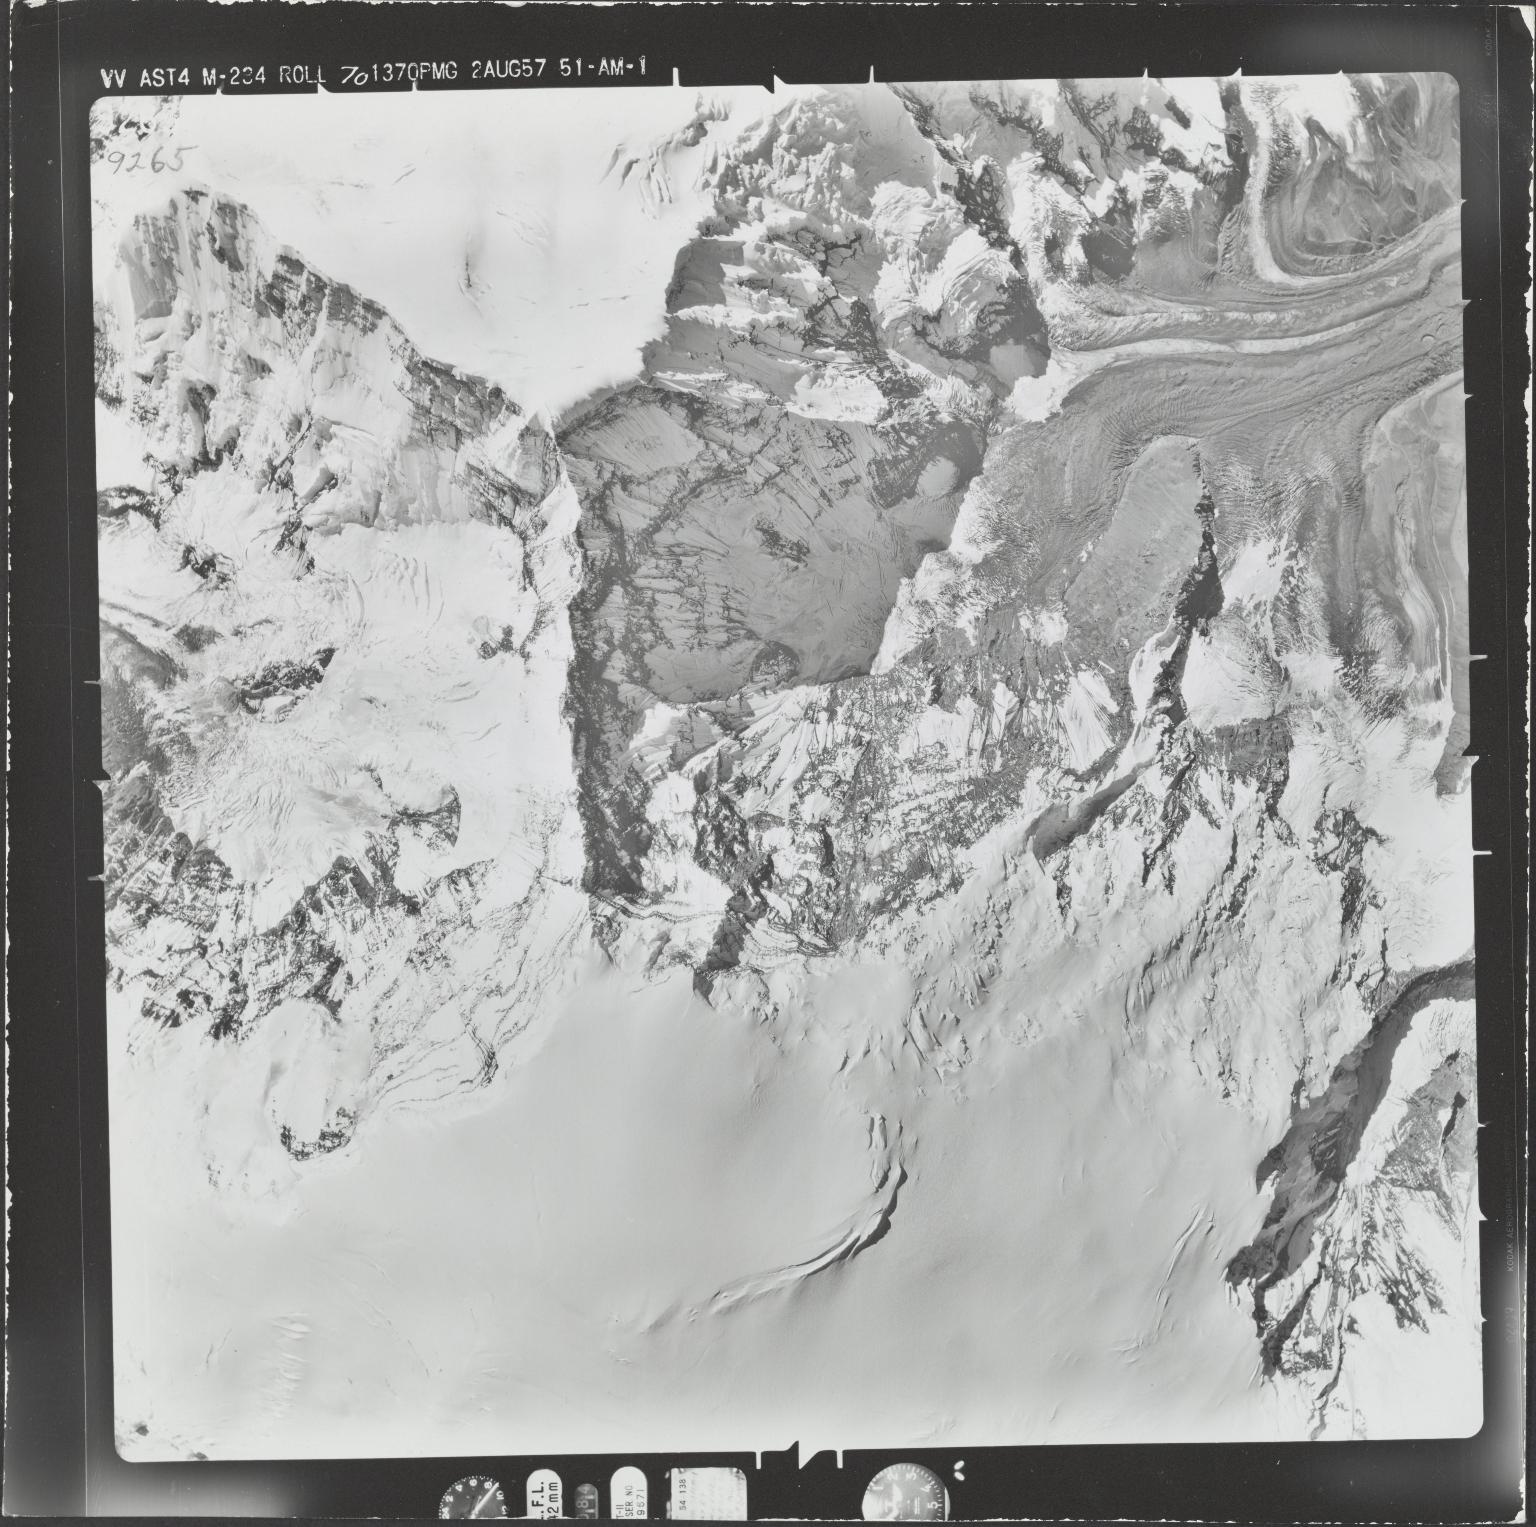 Mount Sanford, aerial photograph M 234 9265, Alaska